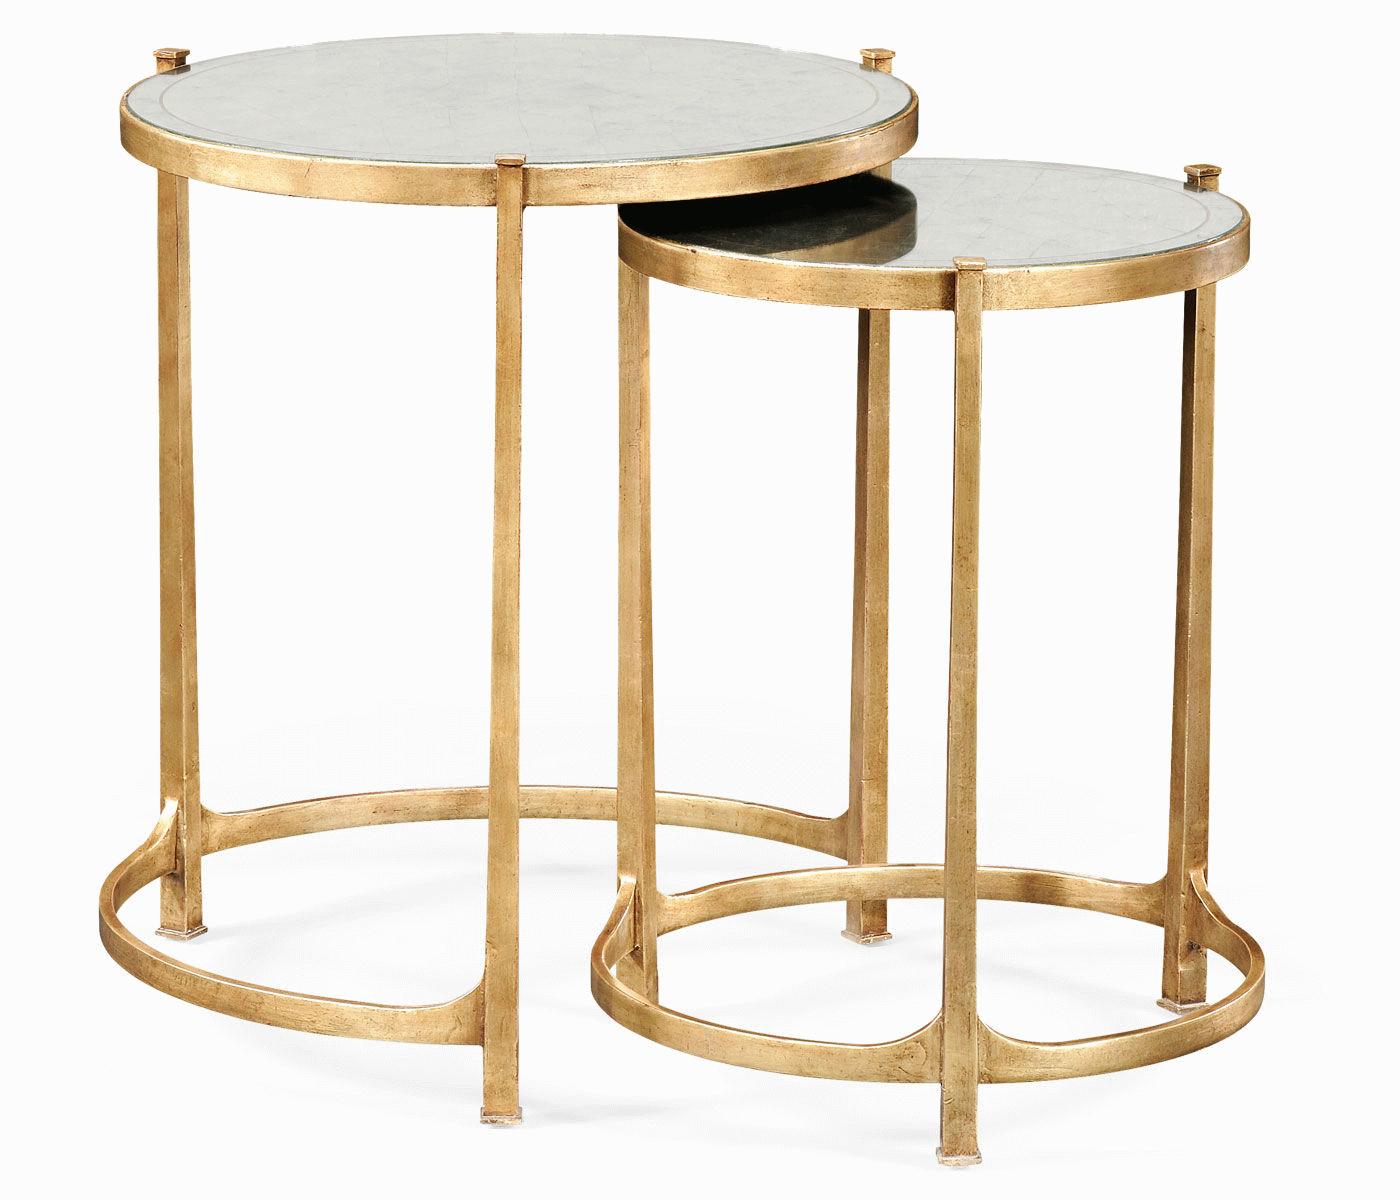 majaci gold accent table tables feller nestingtables goldnestingtablesgoldsidetable goldside concord dear keaton pottery barn trunk end tall occasional oak bar ethan allen dining